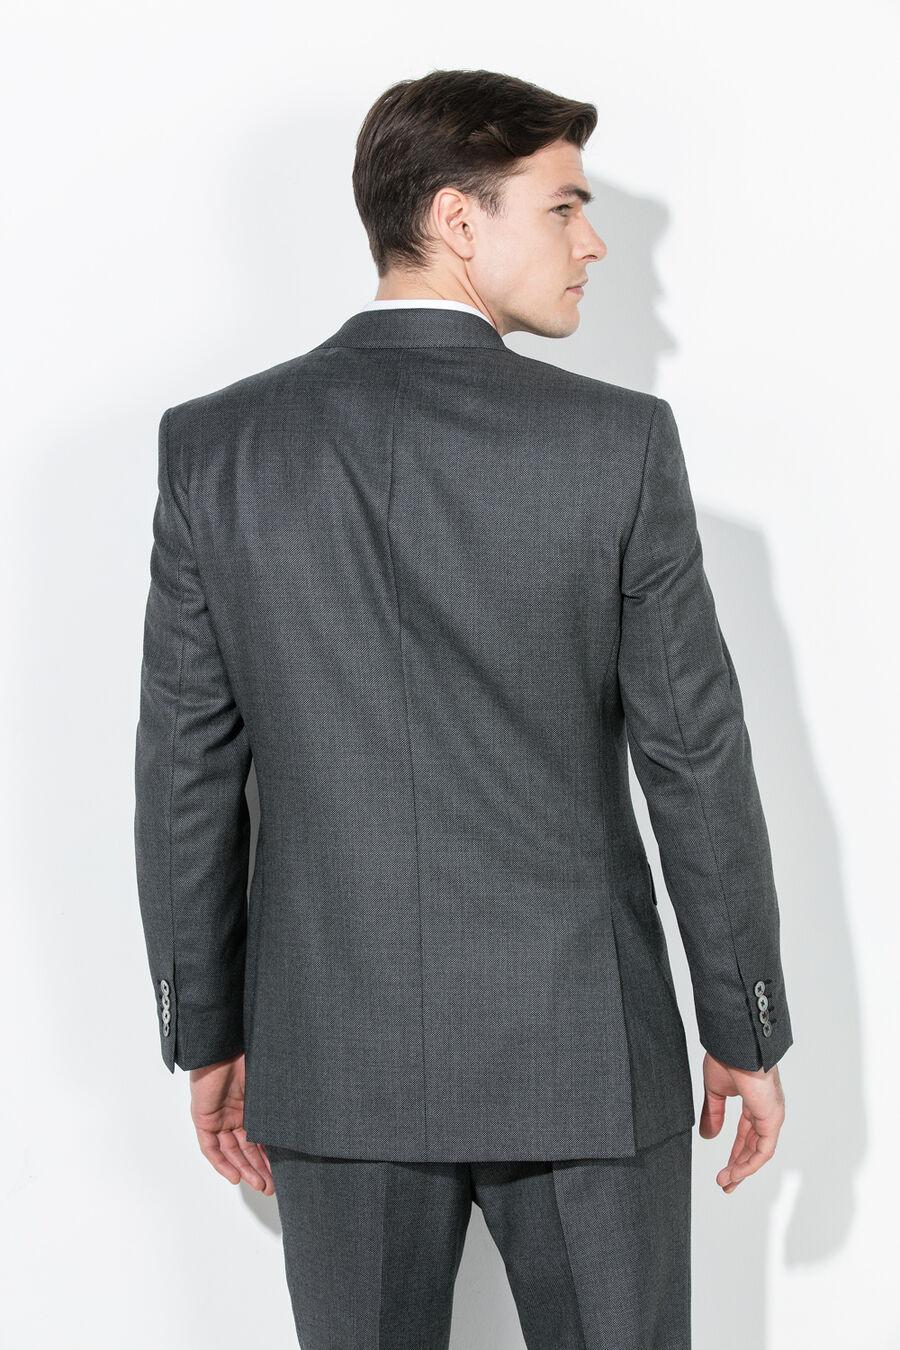 Classic birdseye suit